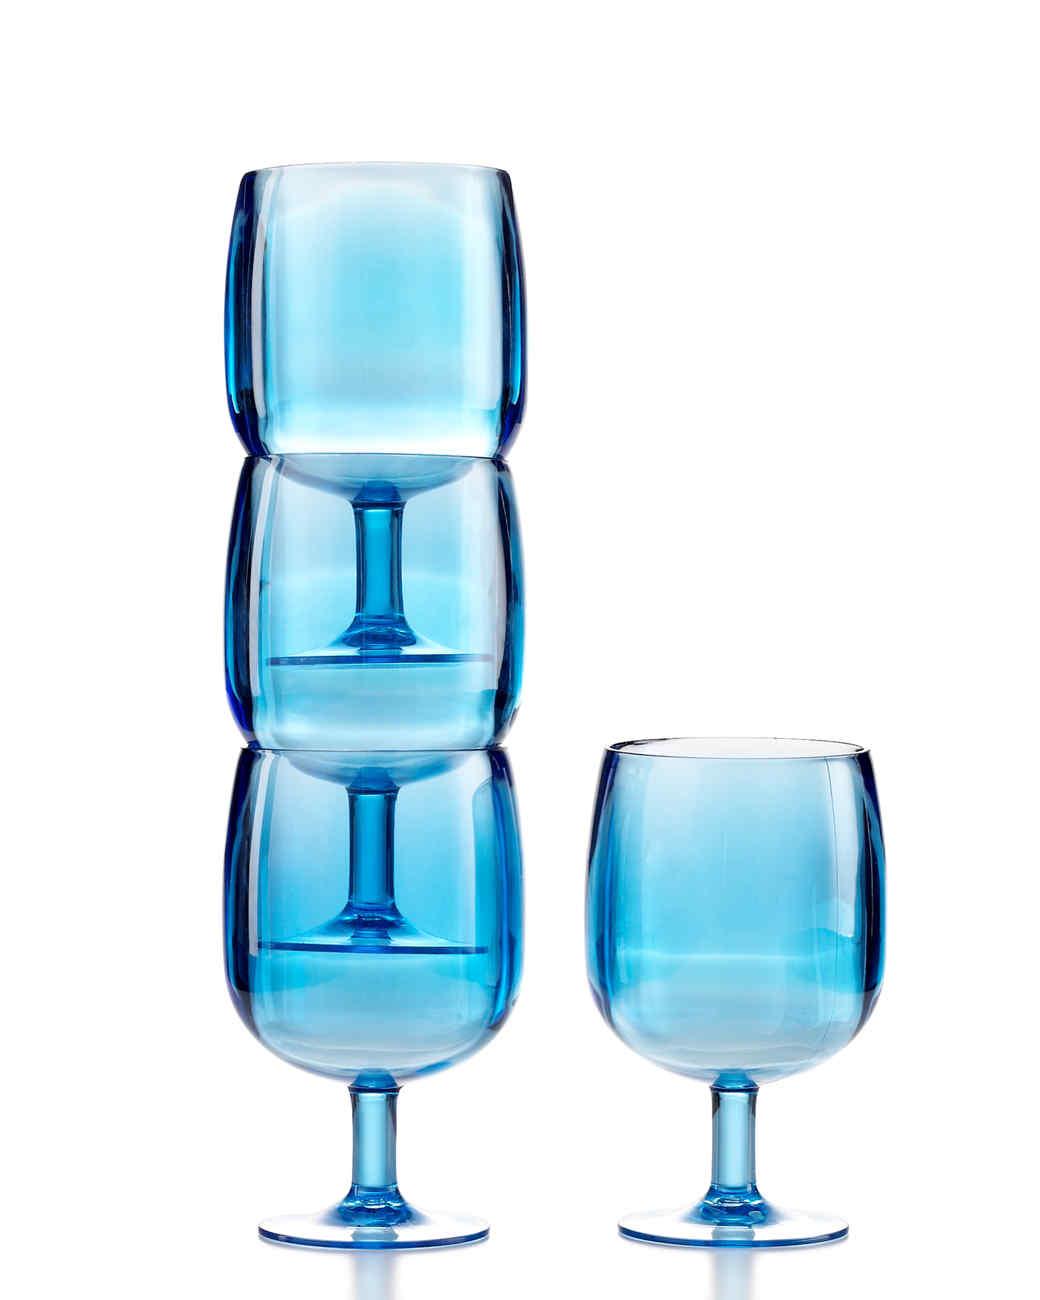 macys-glassware-blue-acrylic-mrkt-0714.jpg